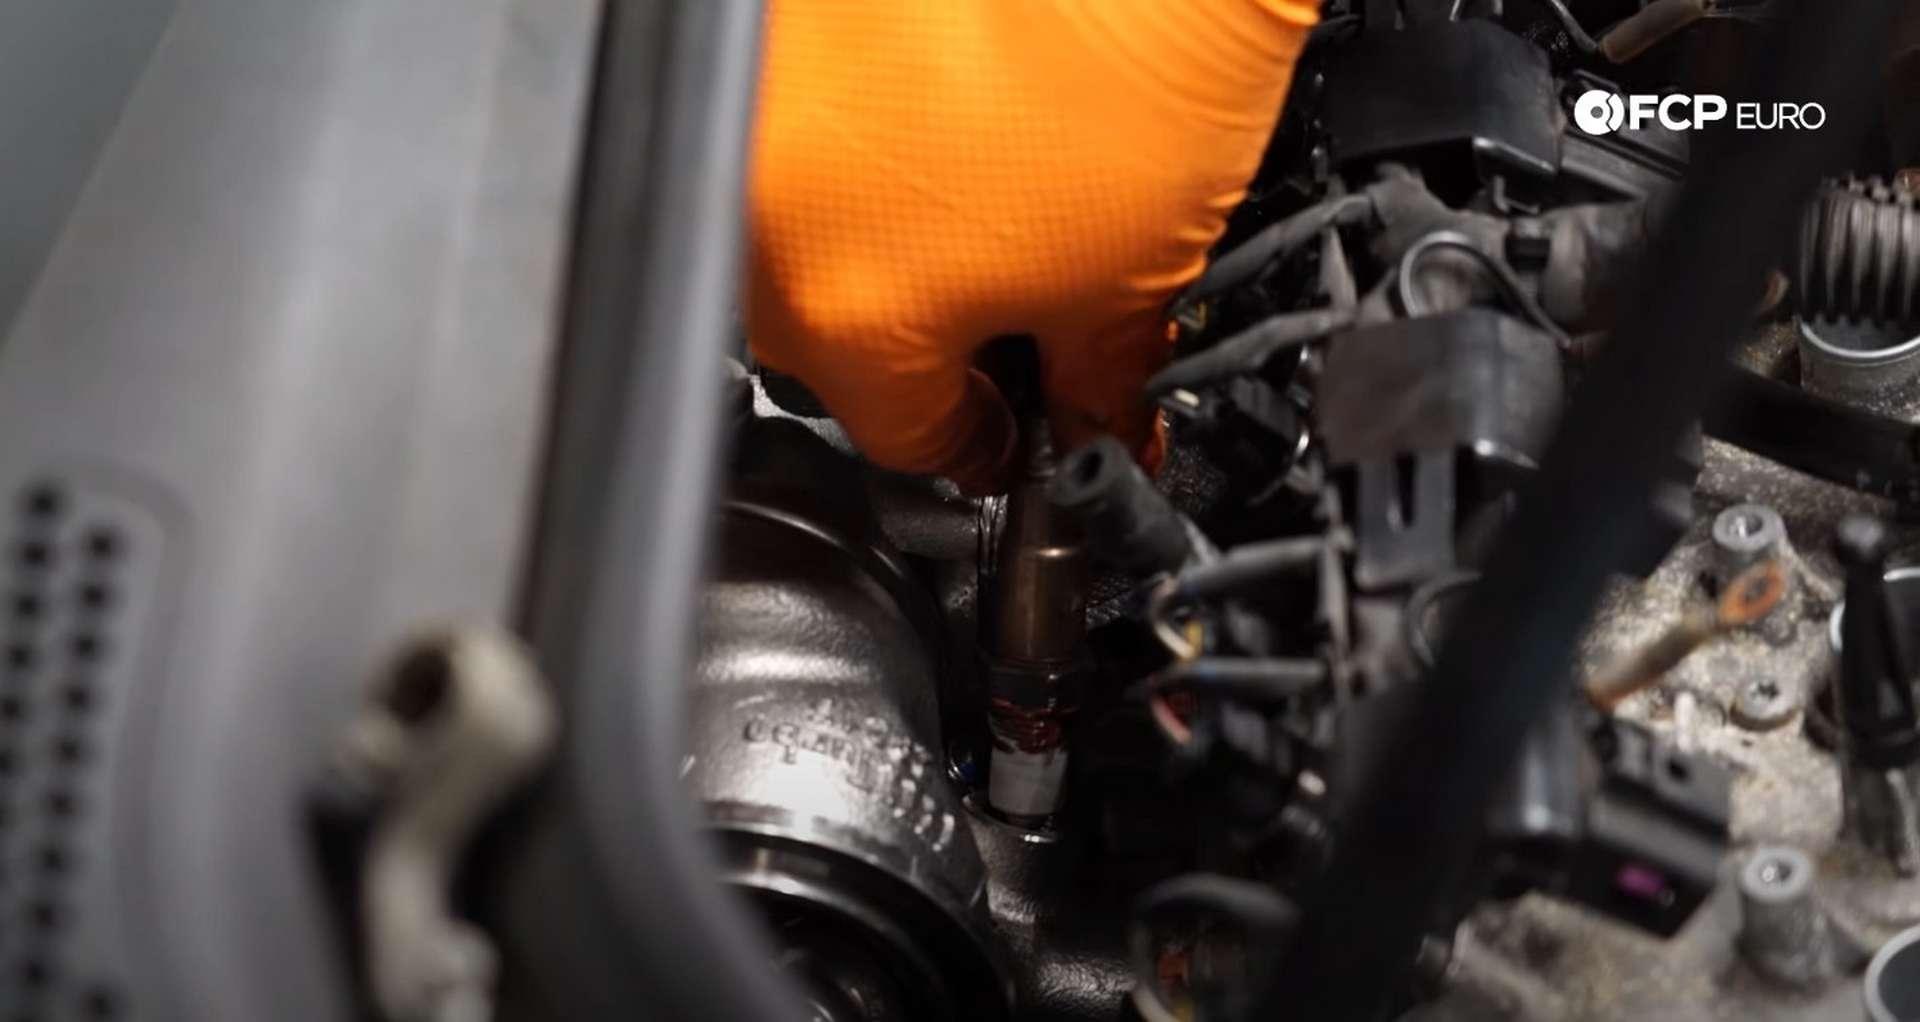 DIY MK7 VW GTI Turbocharger Upgrade installing the upper O2 sensor